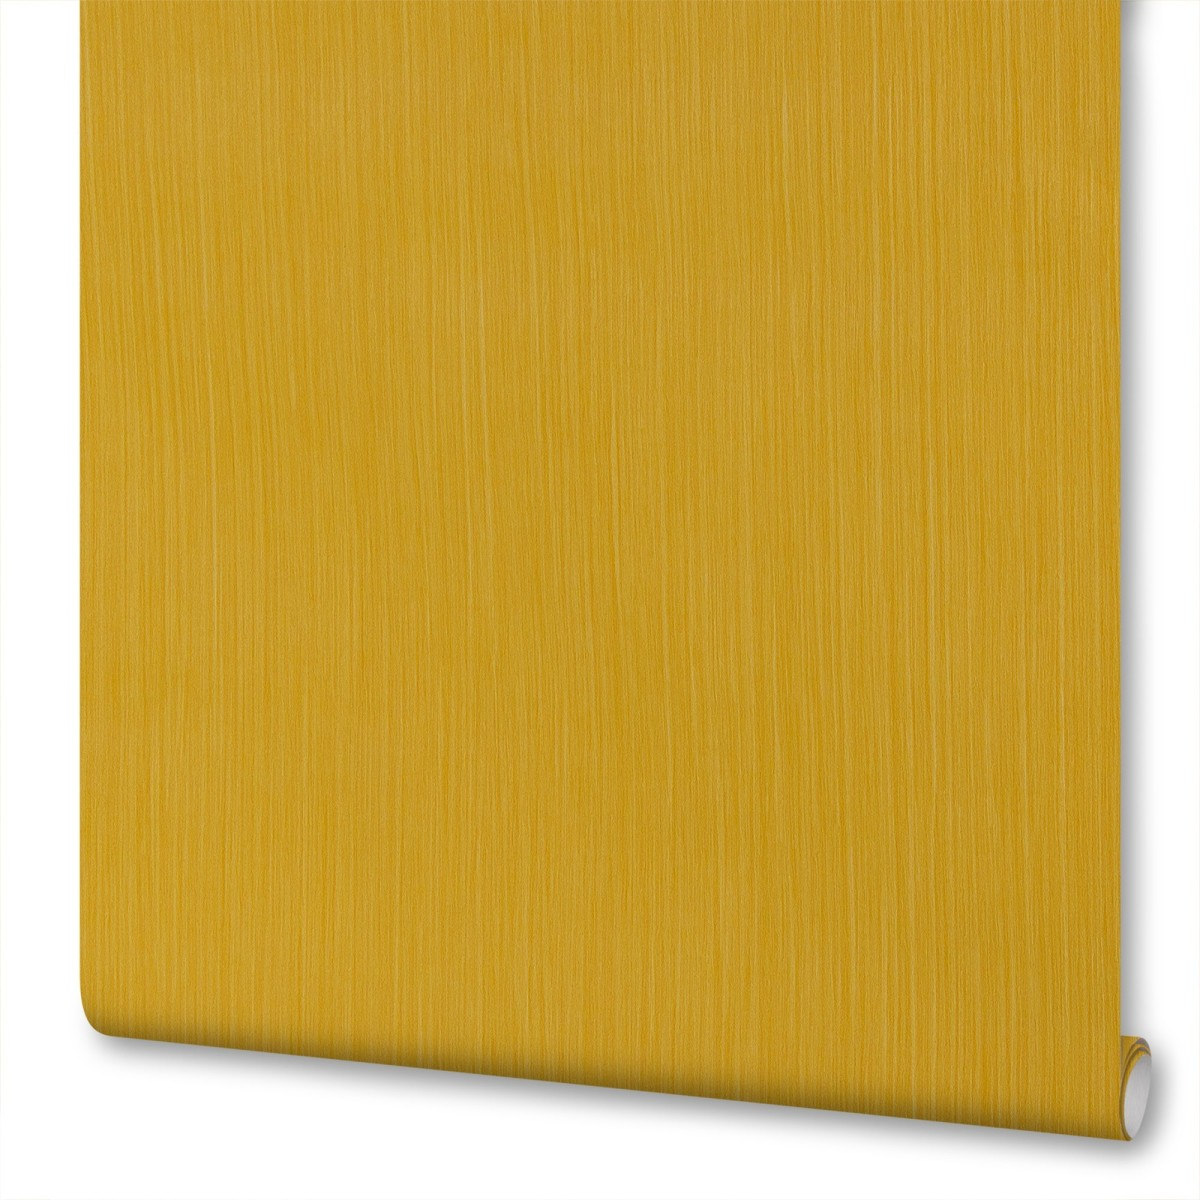 Обои флизелиновые Inspire 106х10м цвет желтый ЭР3724-3